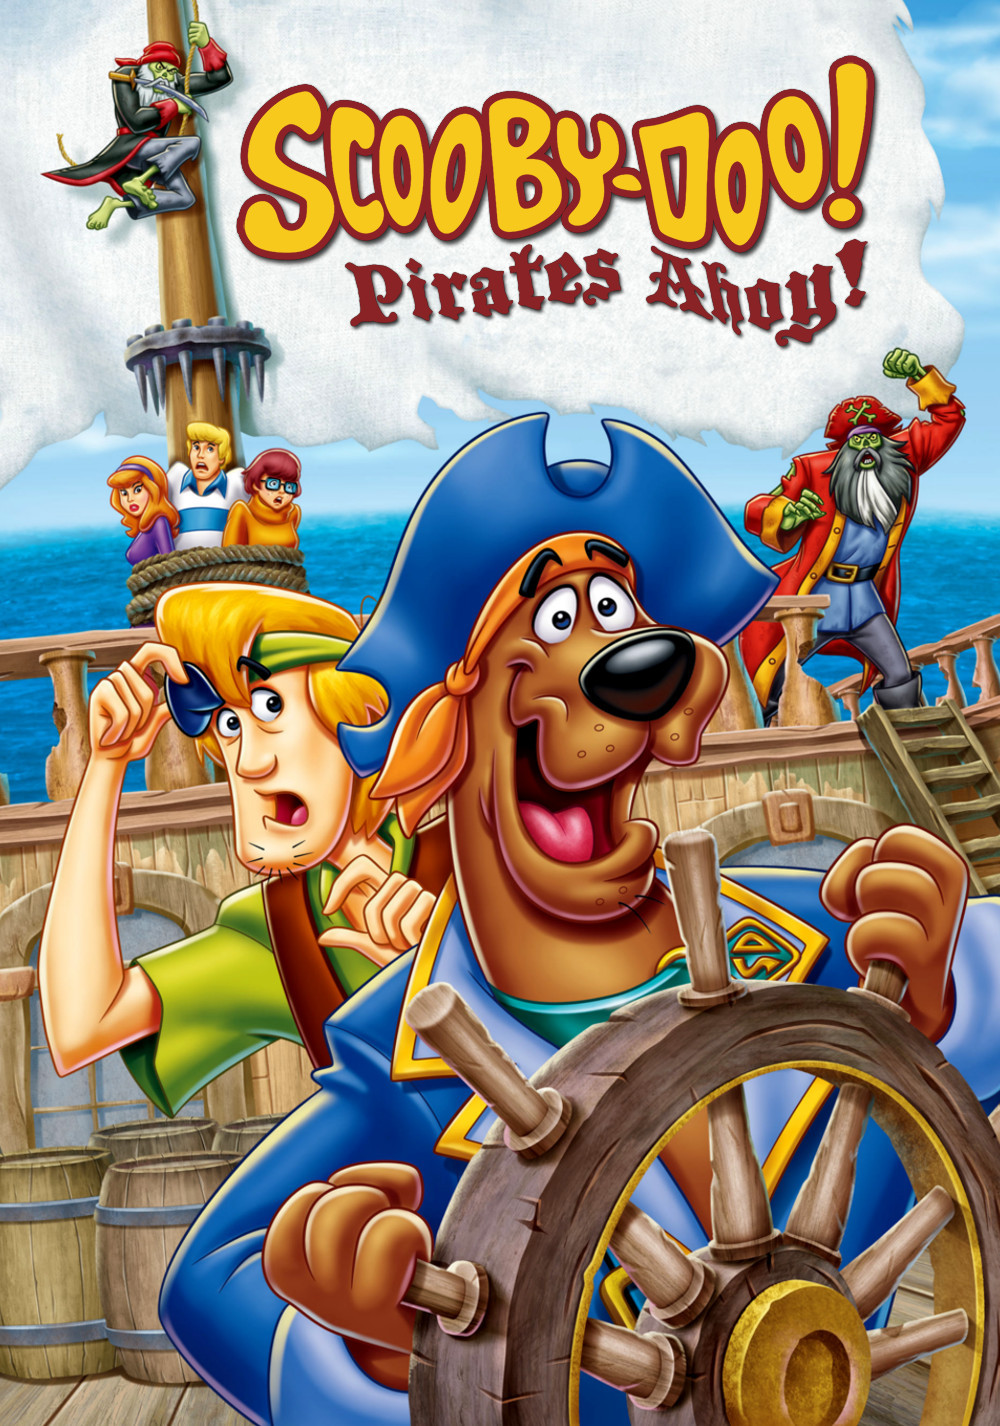 Scooby Doo Pirates Ahoy